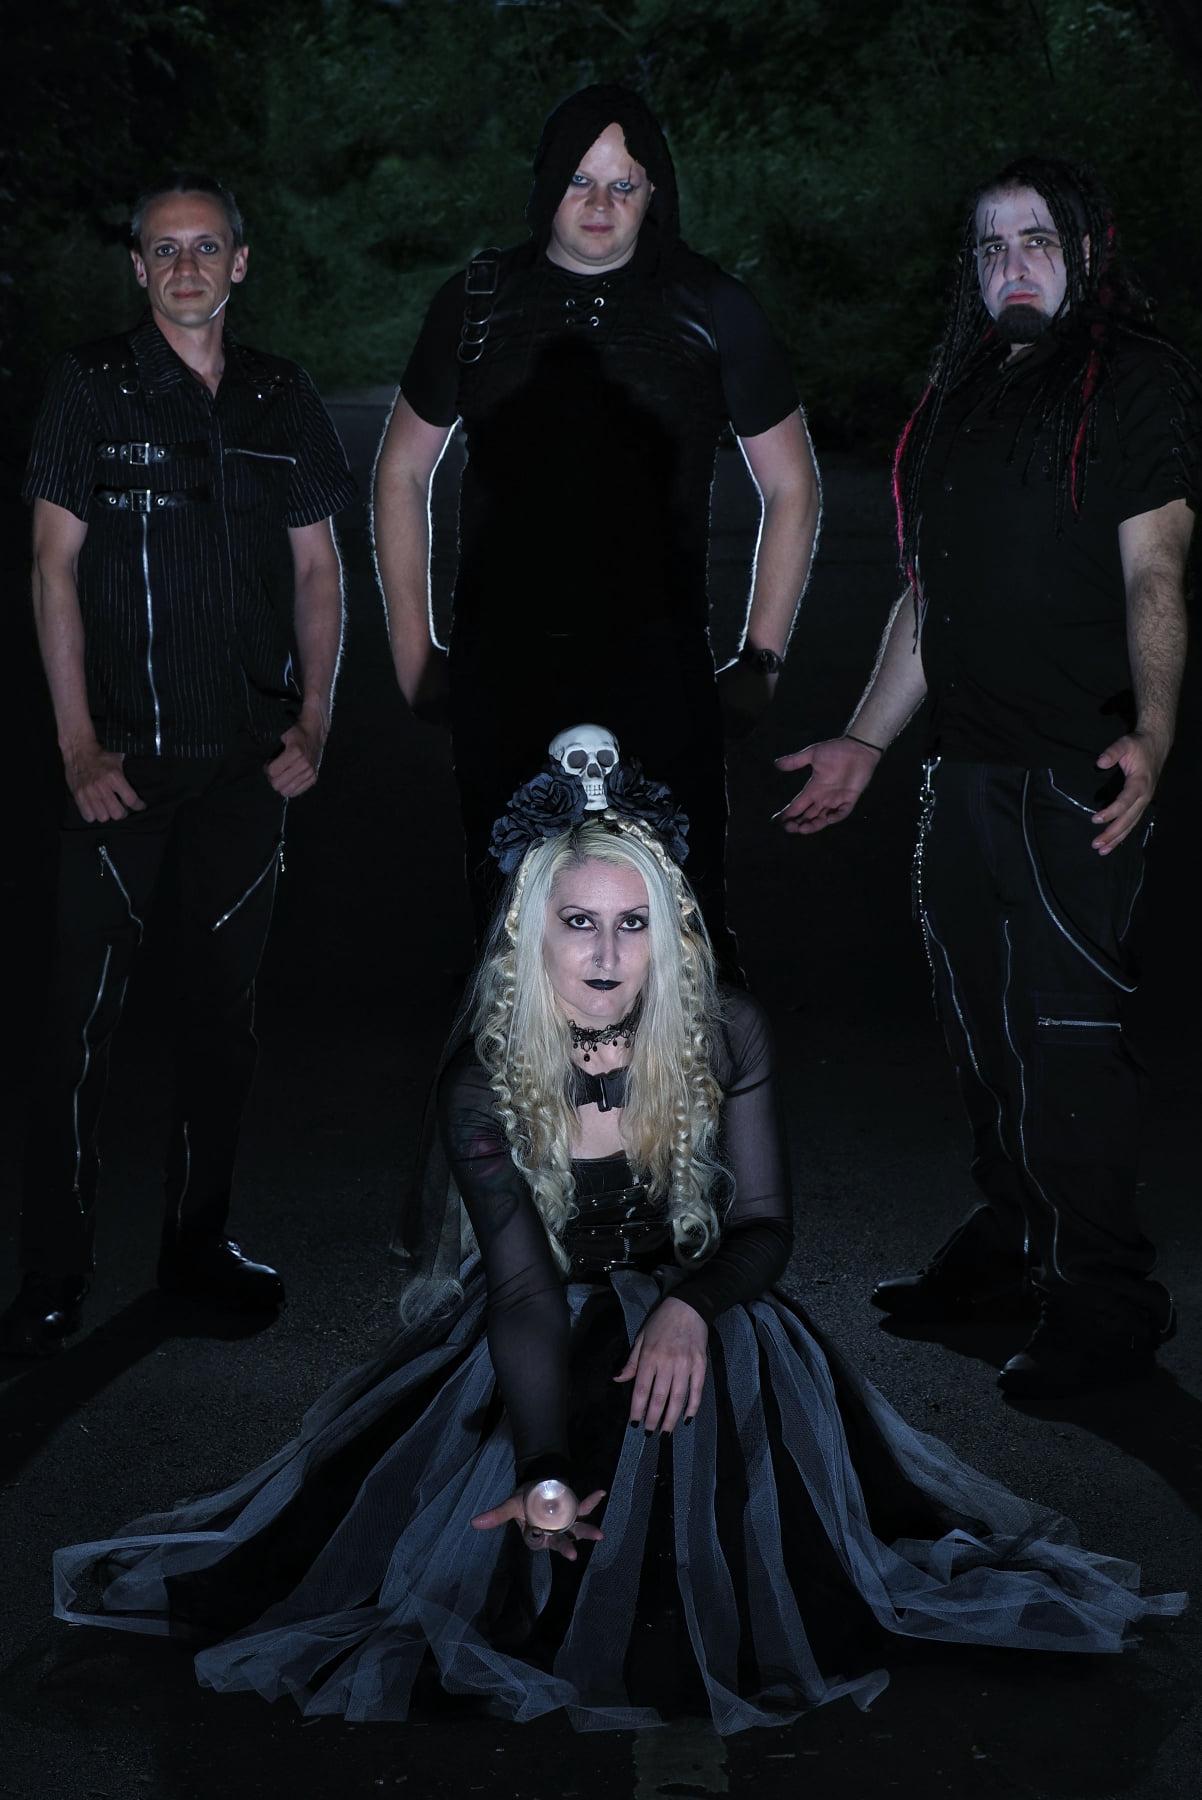 ELKAPATH band